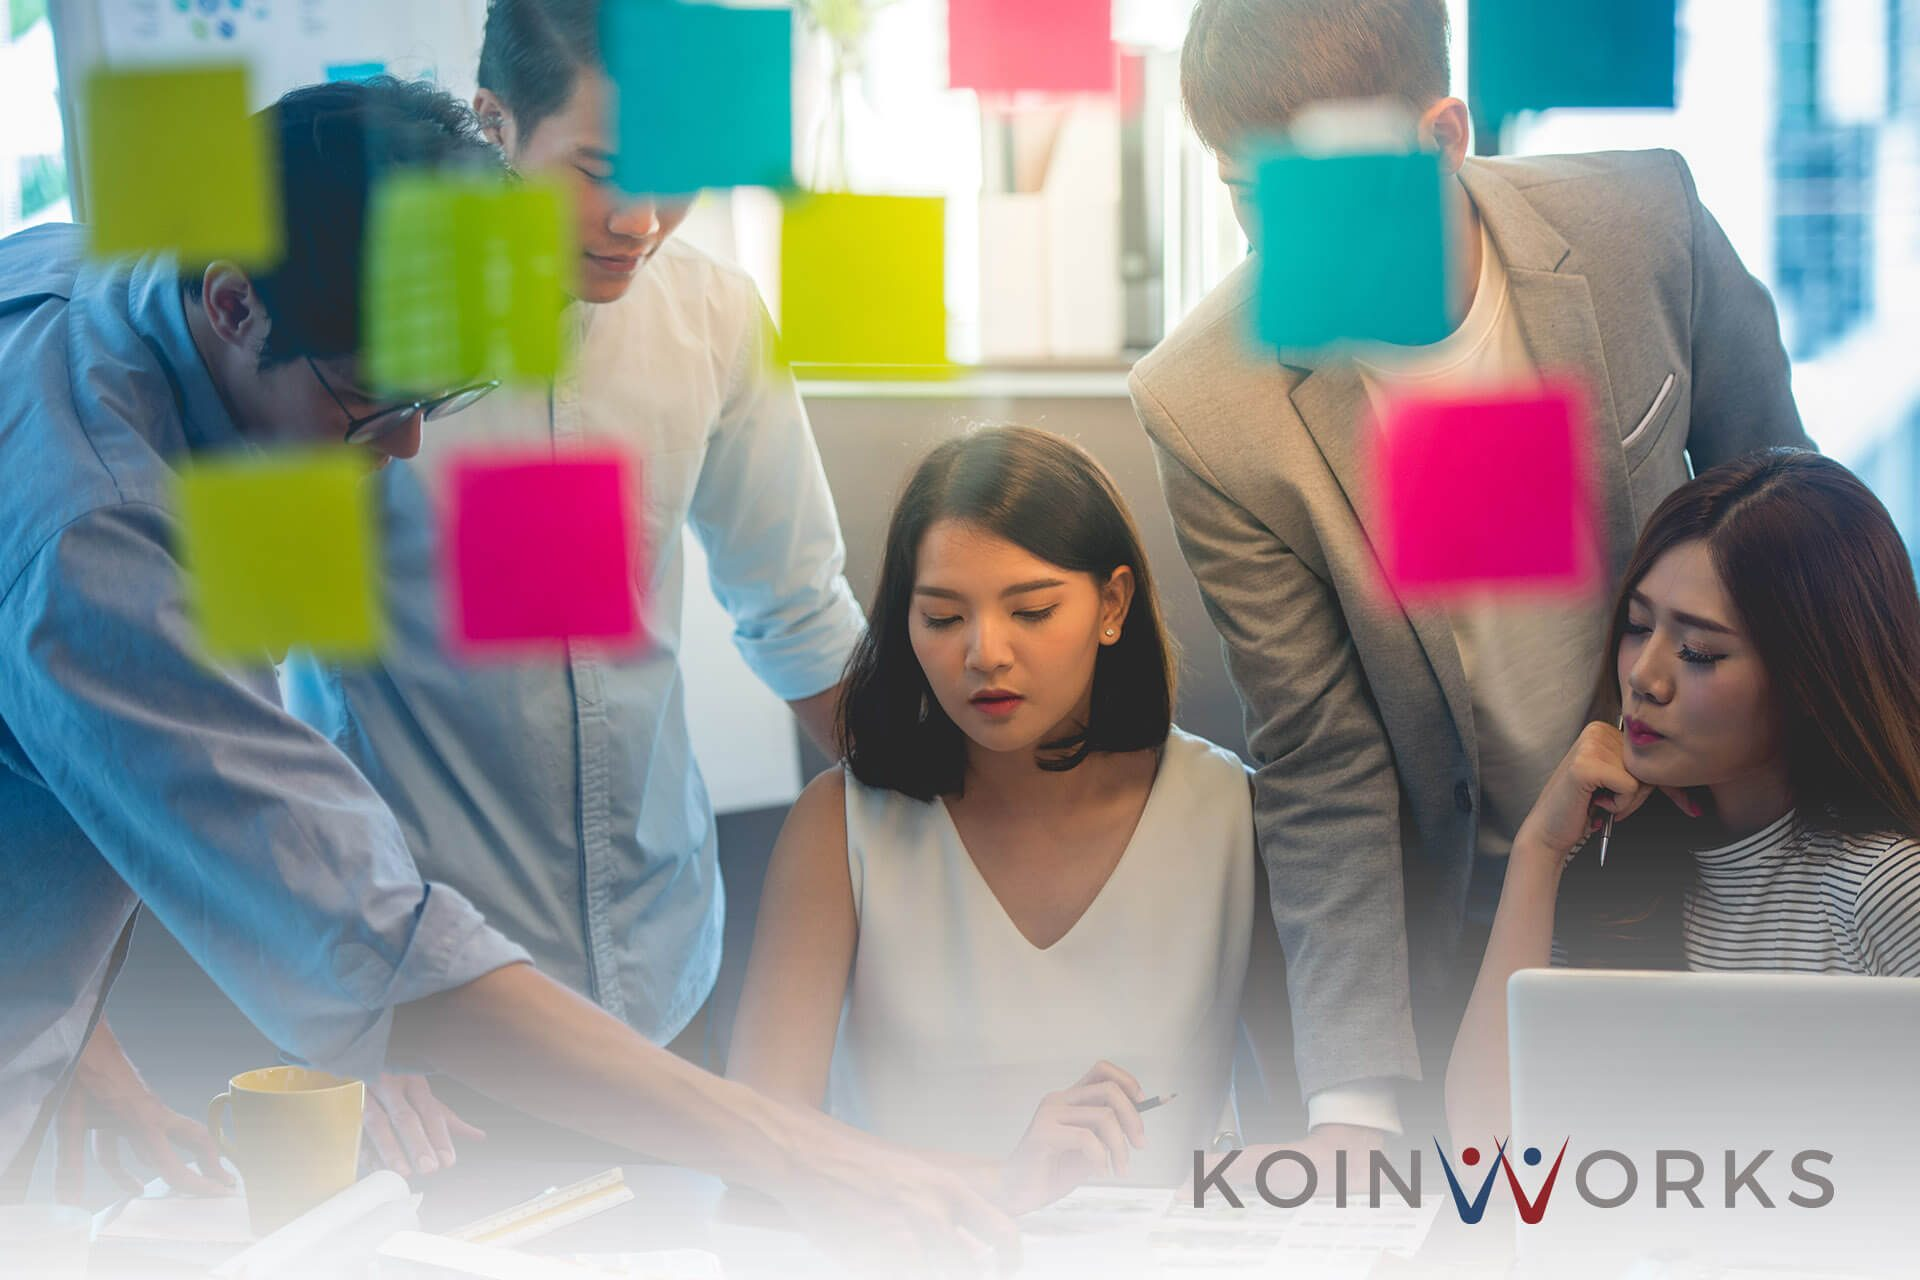 kasbon karyawan - pinjaman karyawan -konten - kolaborasi karyawan - kantor (1) - 5 Dampak Buruk Menunda Pekerjaan yang Akan Mempengaruhi Karier Anda